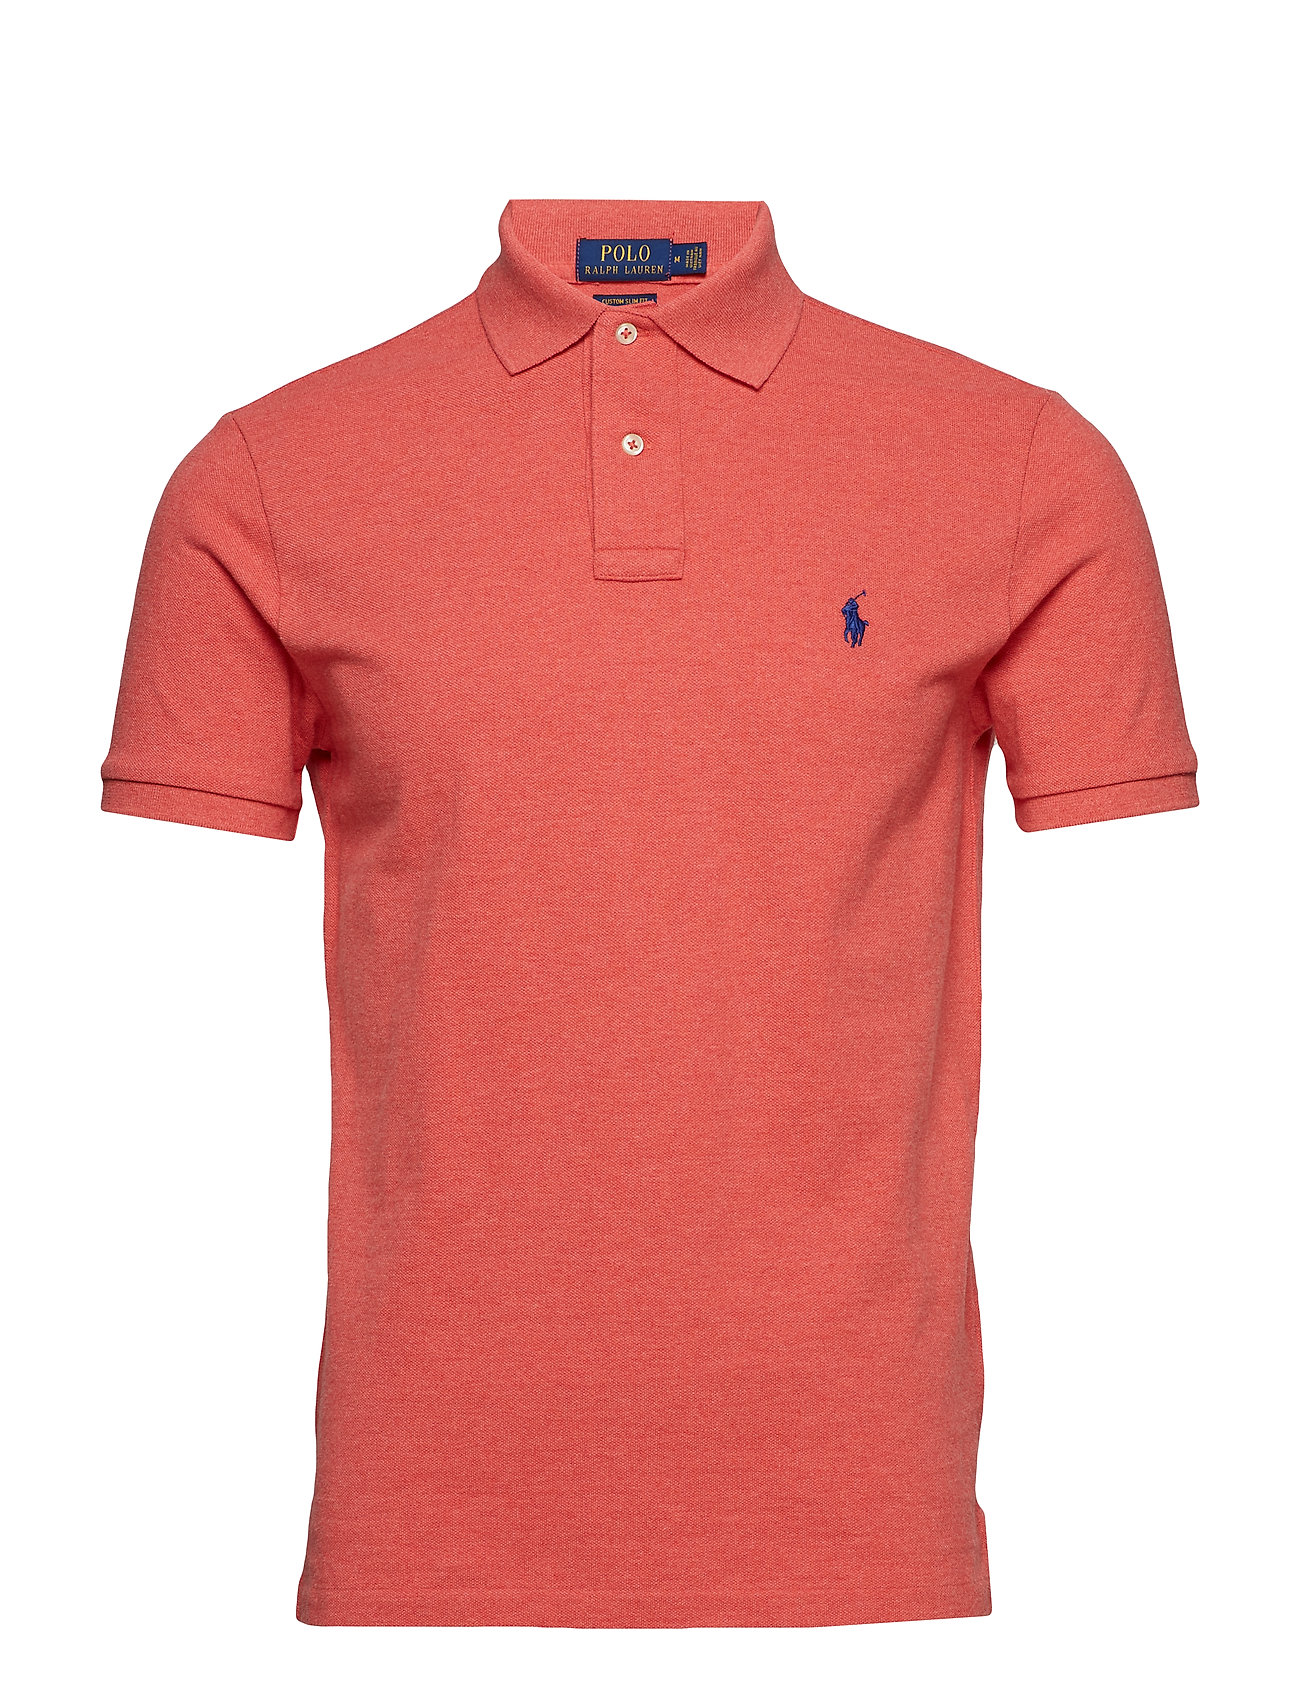 Sskccmslm1-short Sleeve-knit (Highland Rose Hea) (£80) - Polo Ralph ... 228b03bb1322